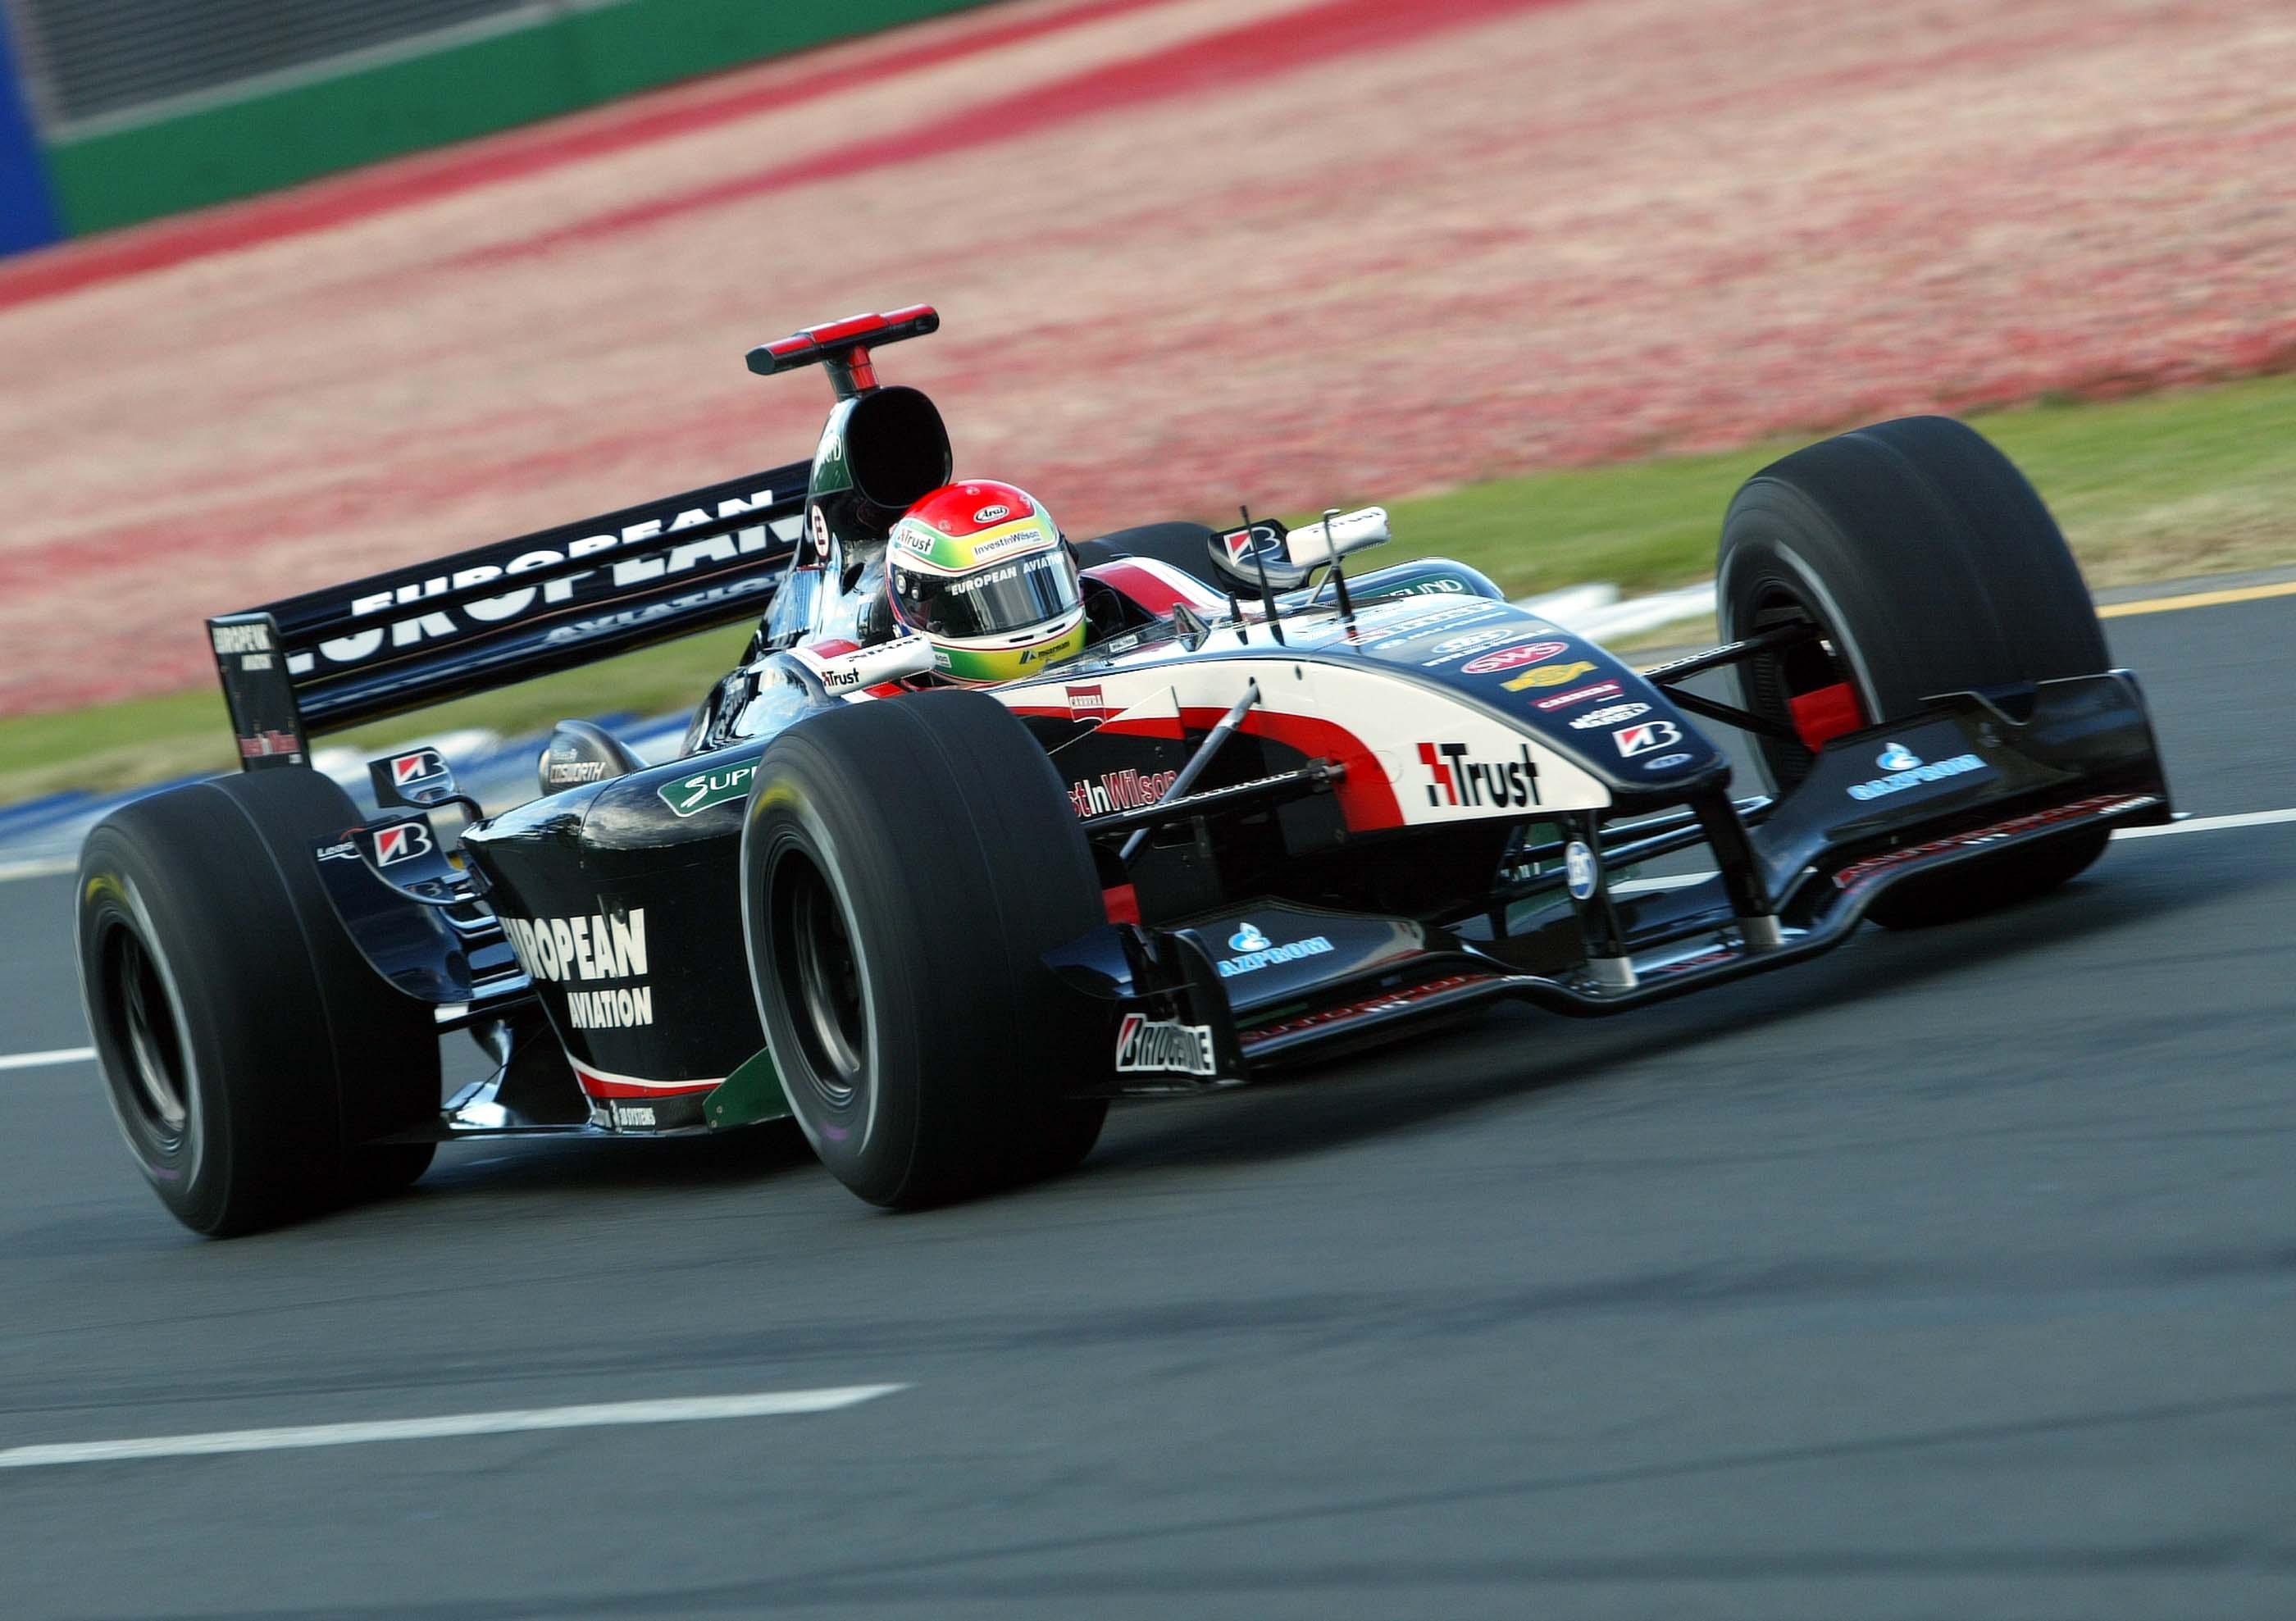 Melbourne, F1, Training, Jw